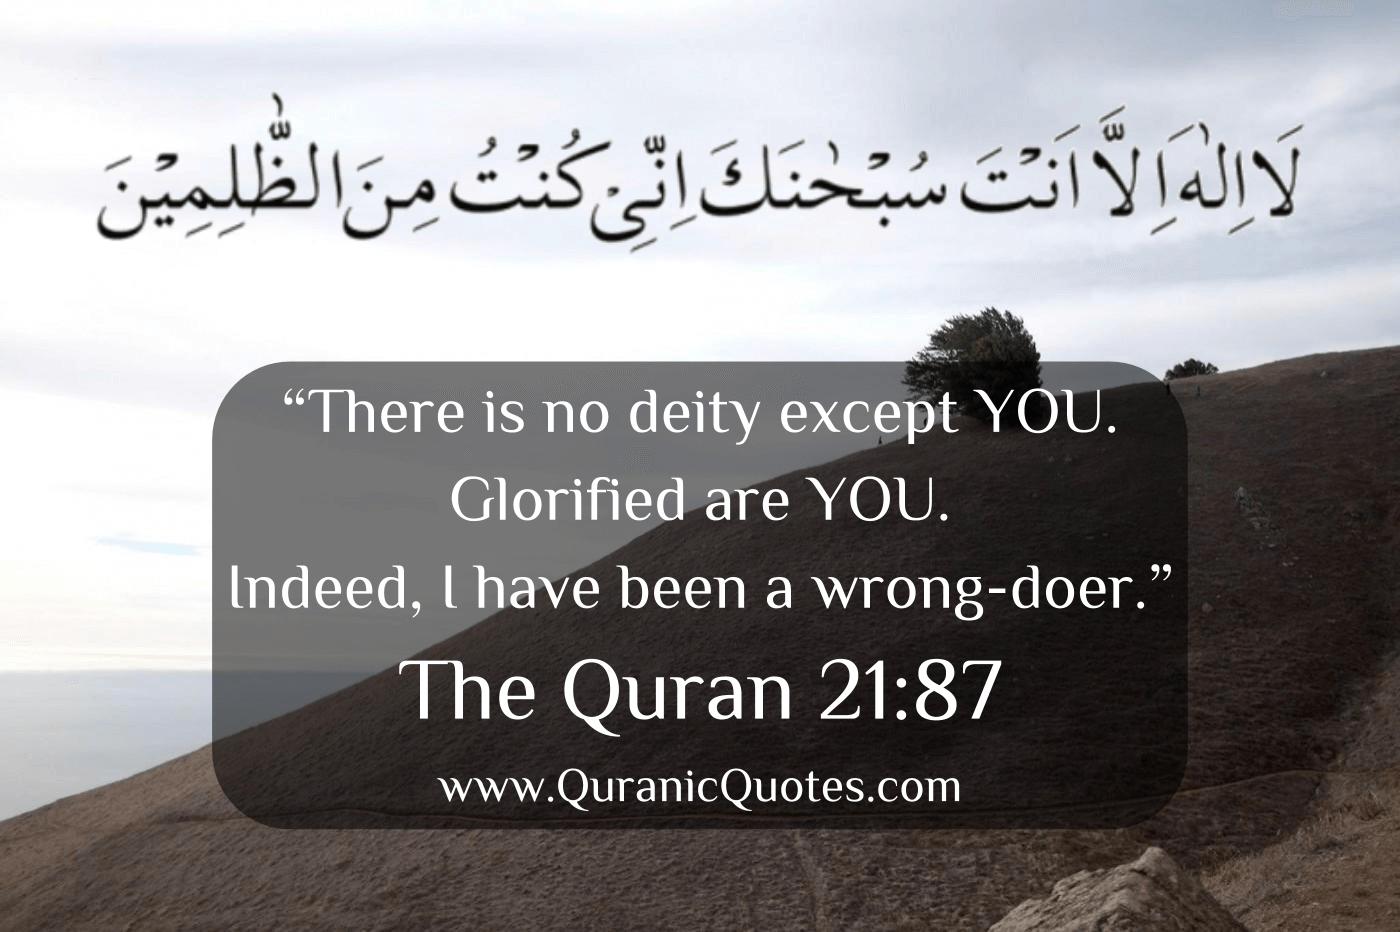 Quotes Quran 291 Best Quranic Quotes Images On Pinterest  Quran Quotes Allah